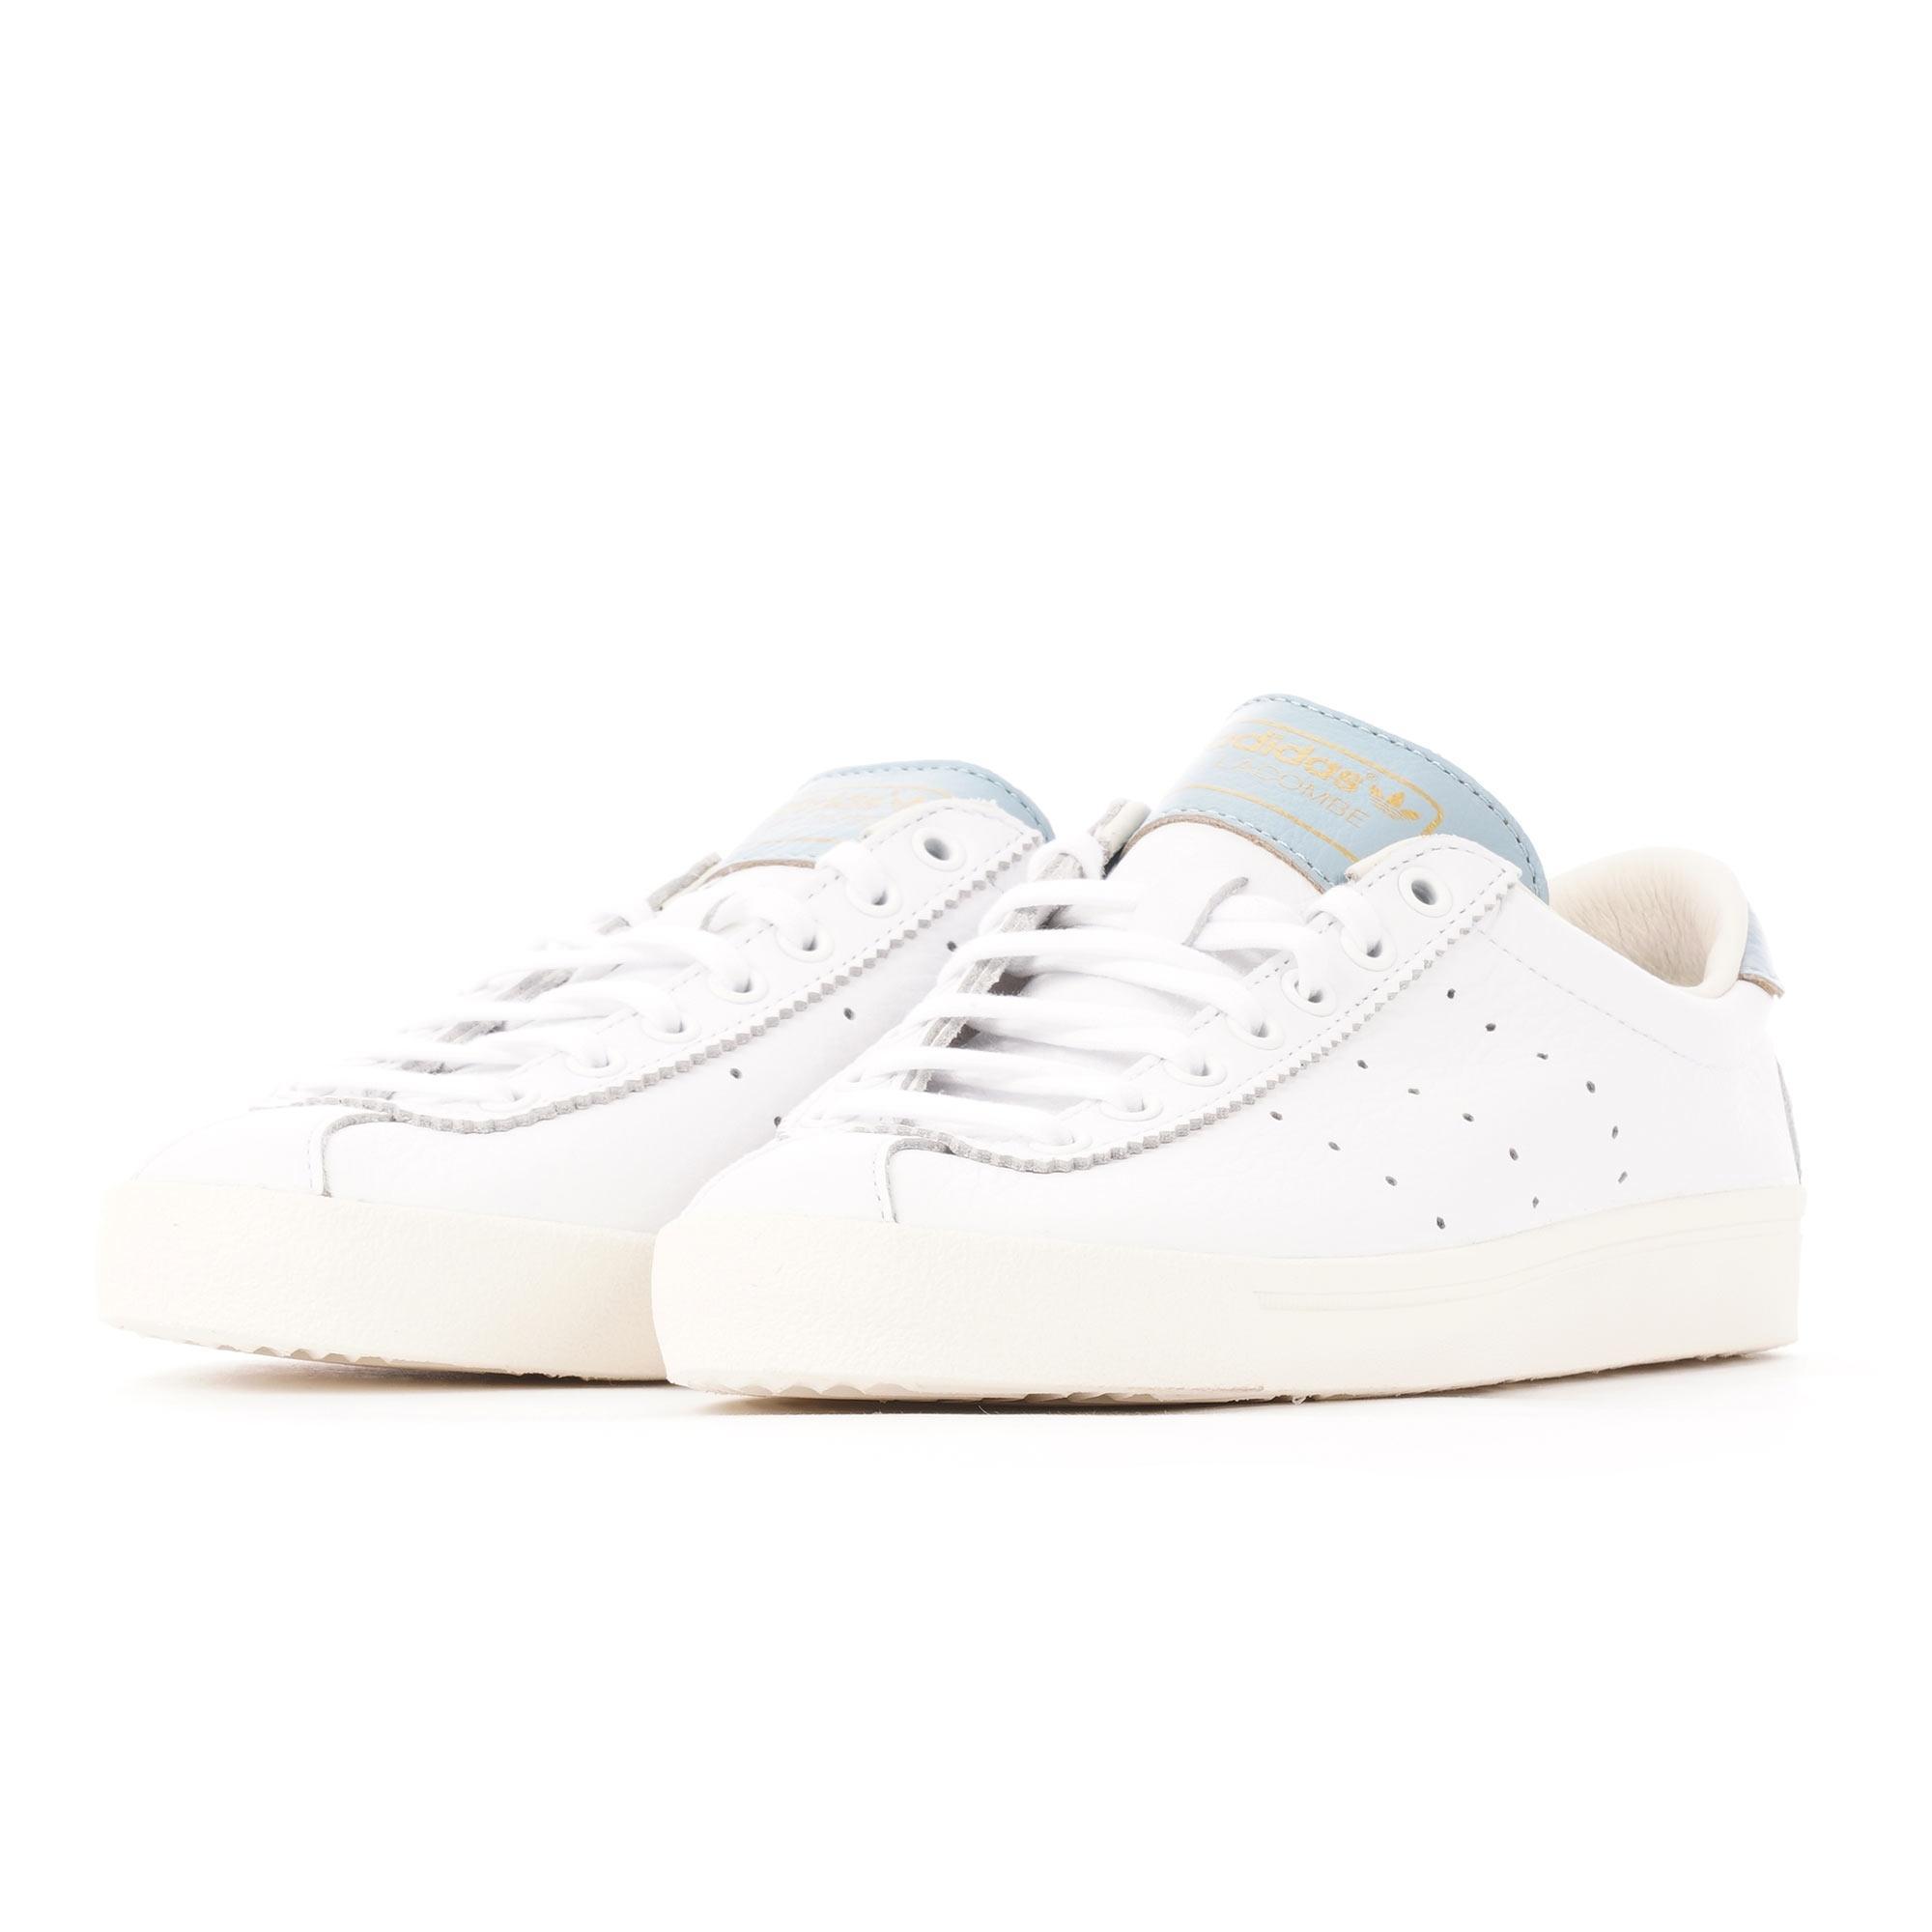 0c4e4f9c7b8f adidas Originals Lacombe in White - Lyst